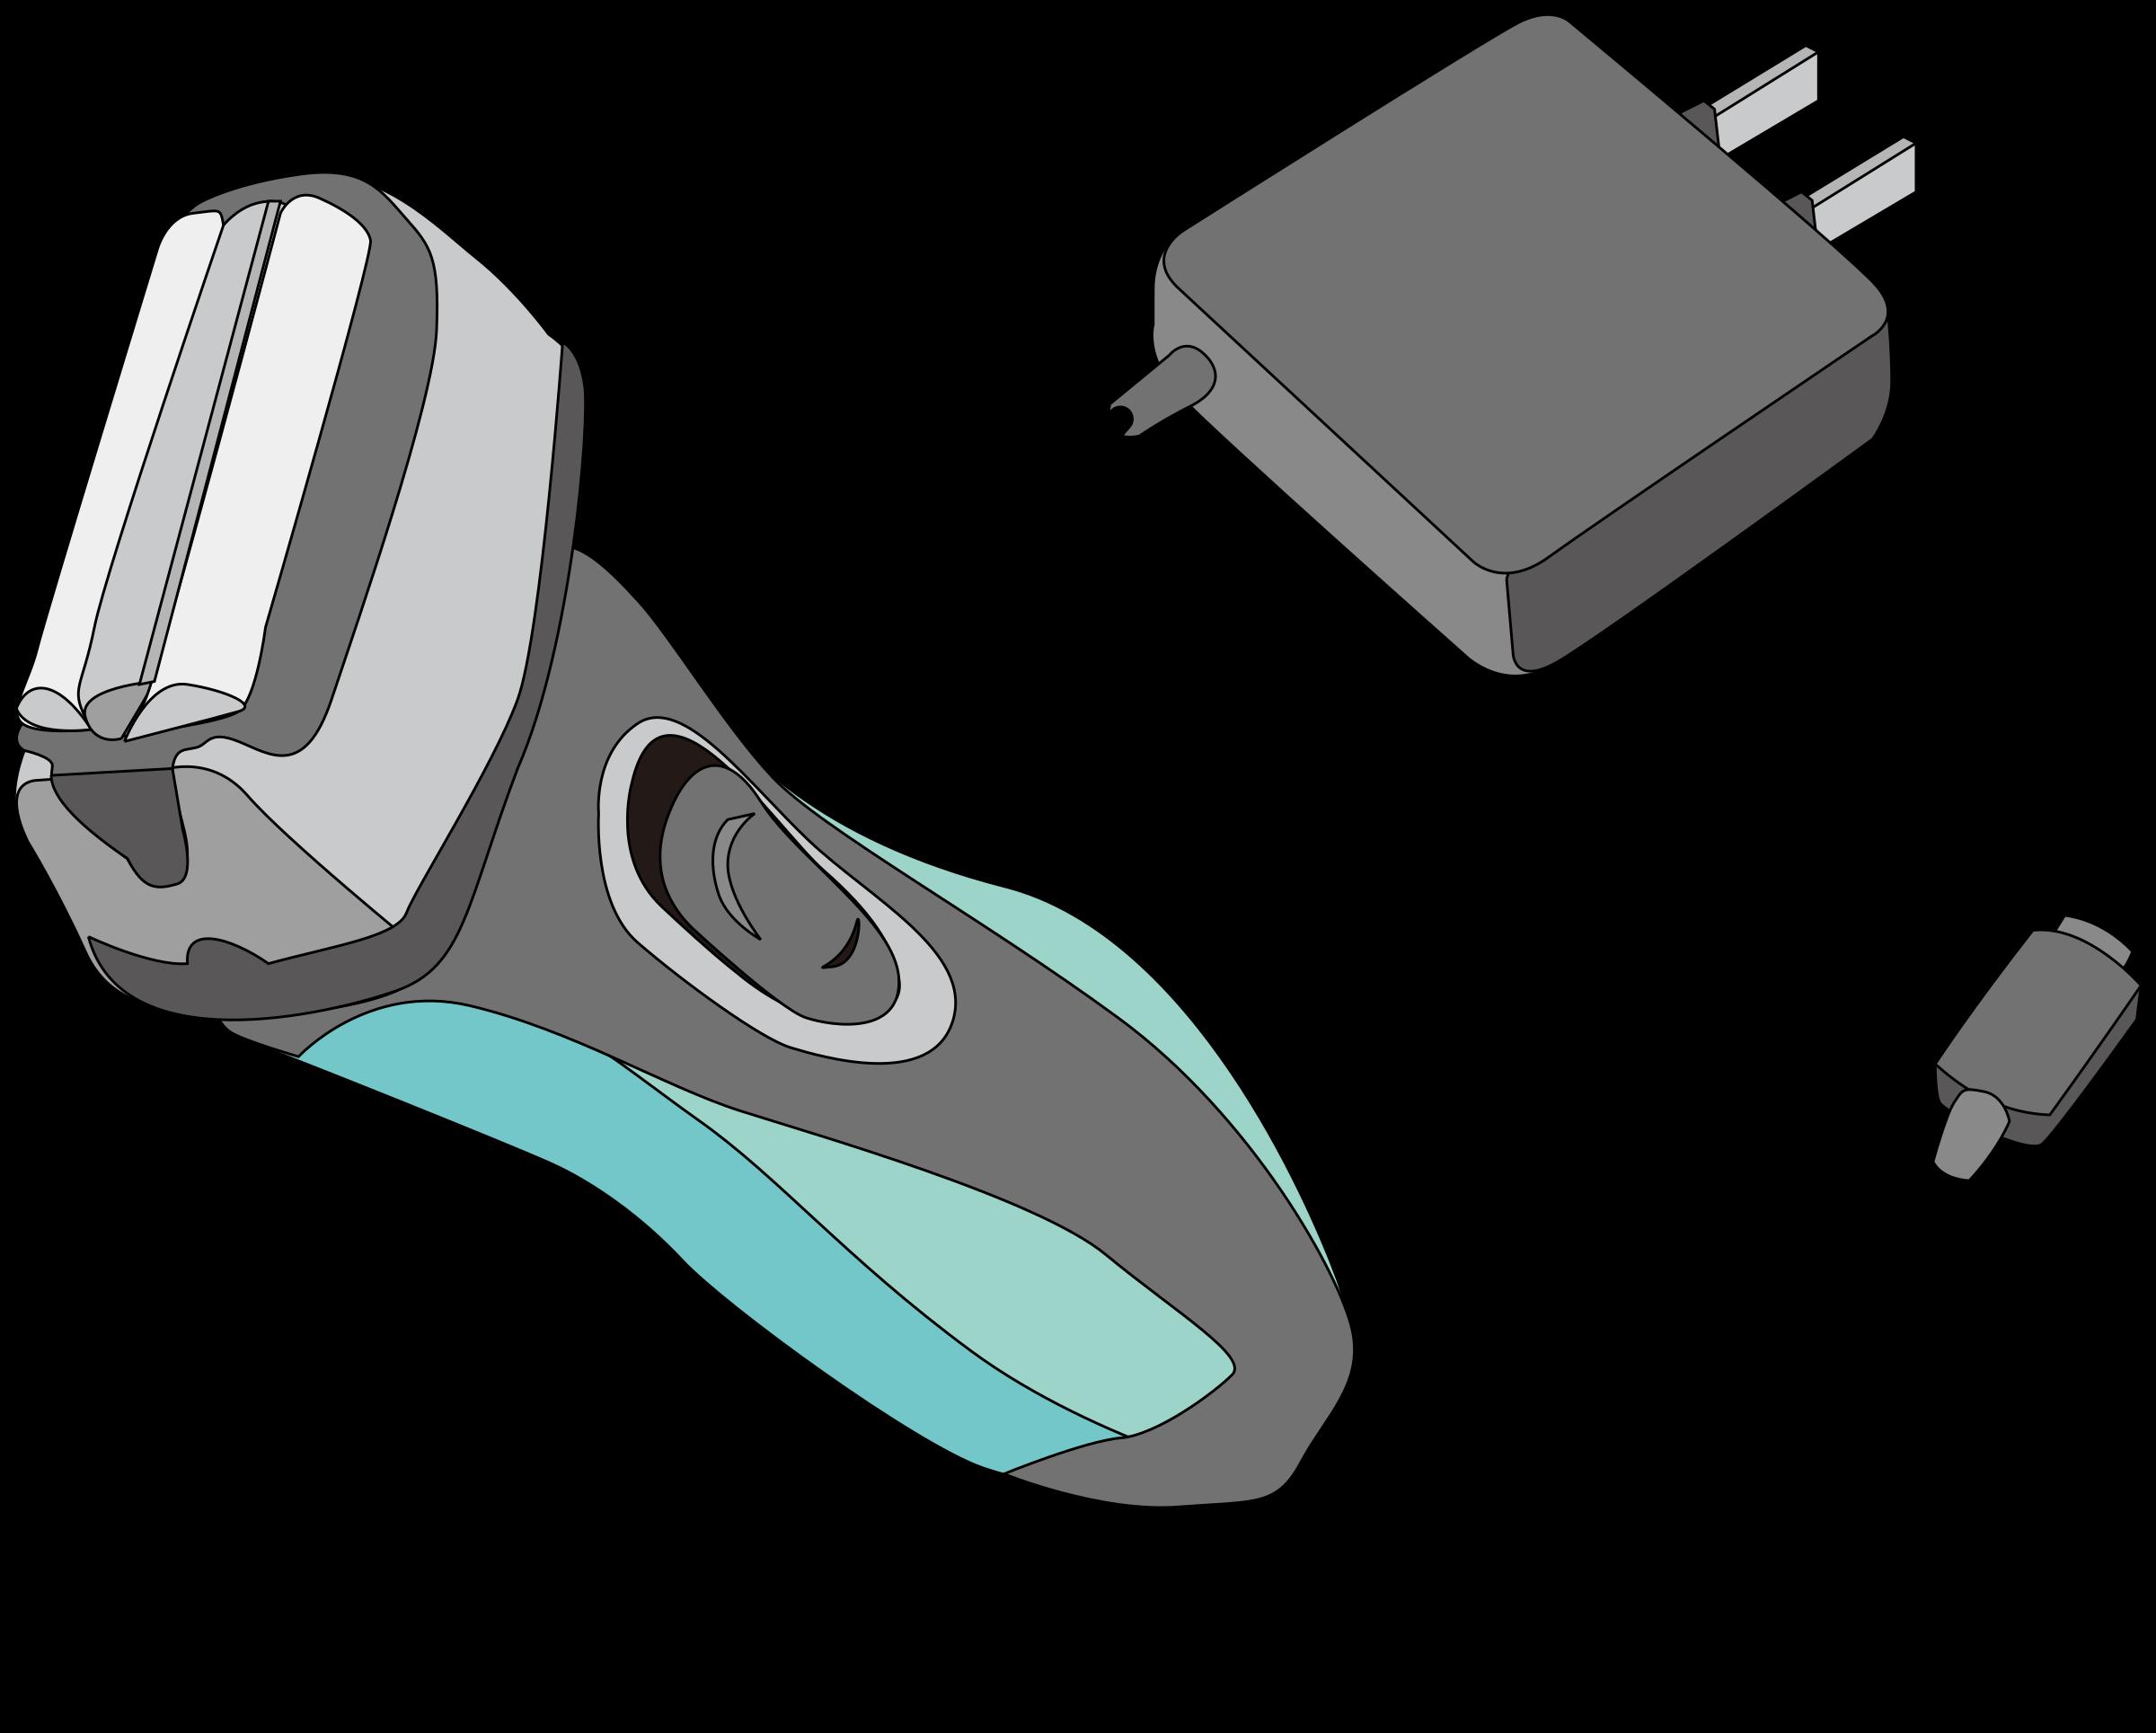 Electric clipart equipment. Shaver razor big image